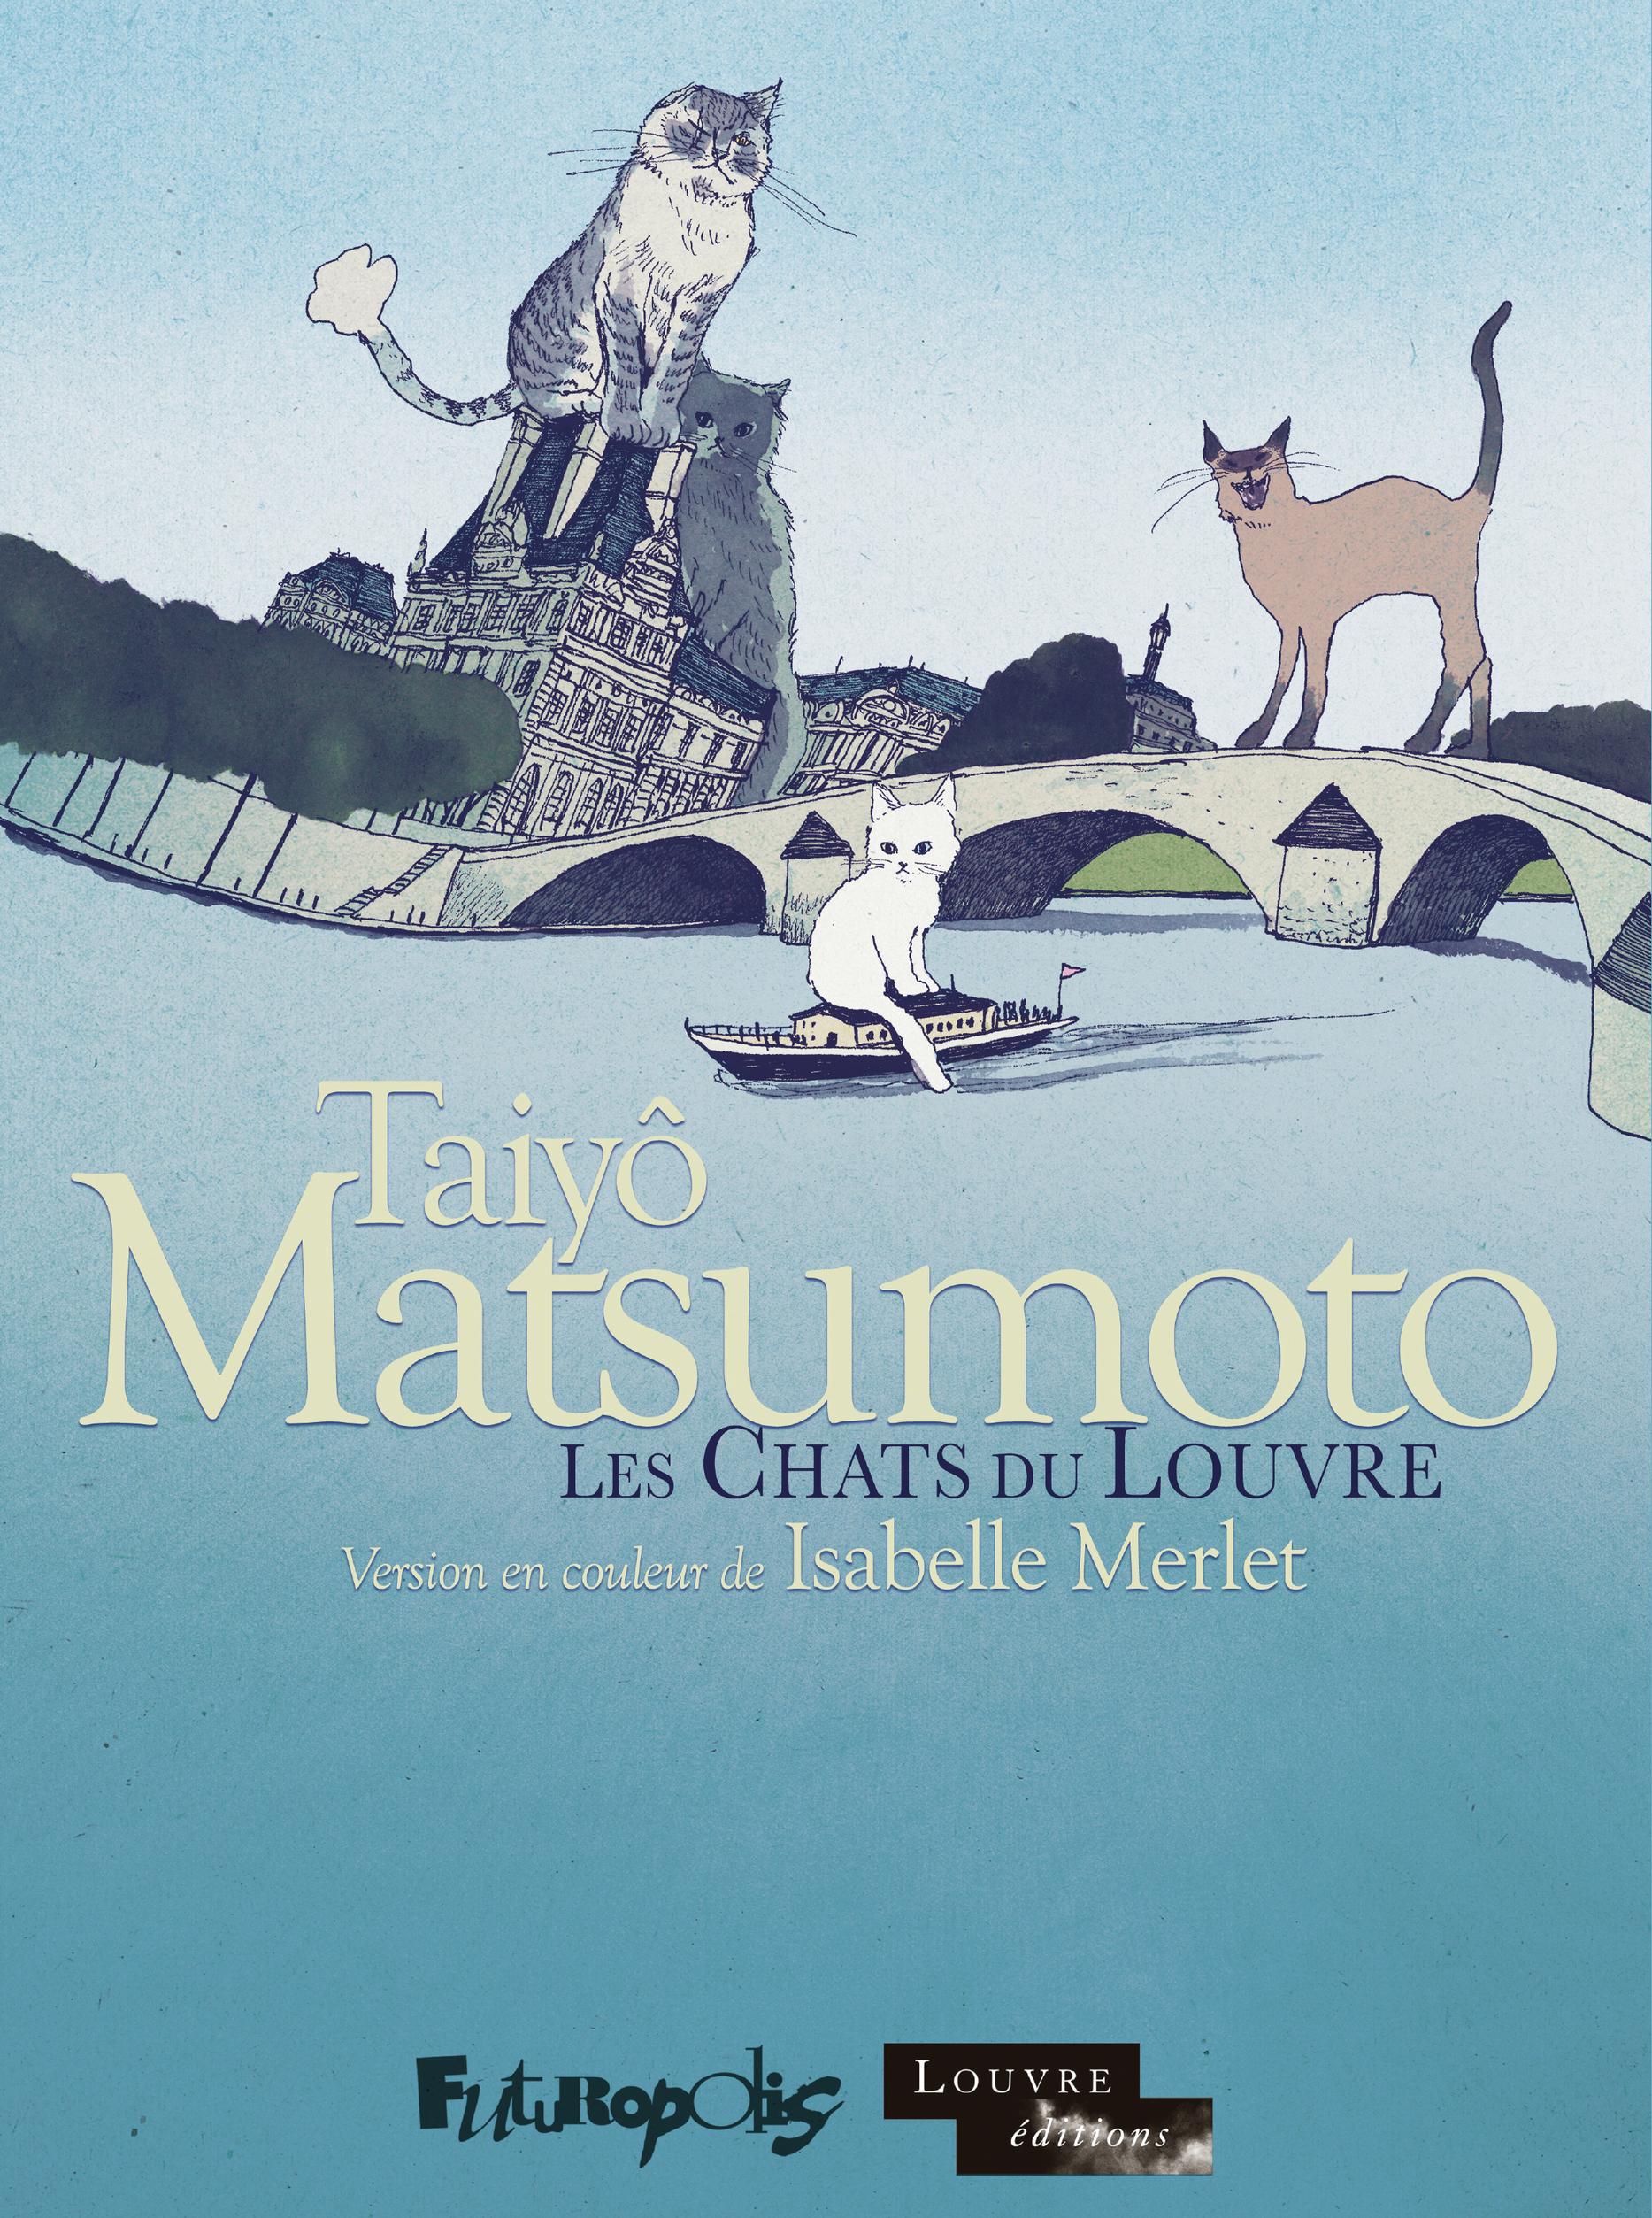 Les chats du Louvre I, II: L'intégrale | Matsumoto, Taiyo